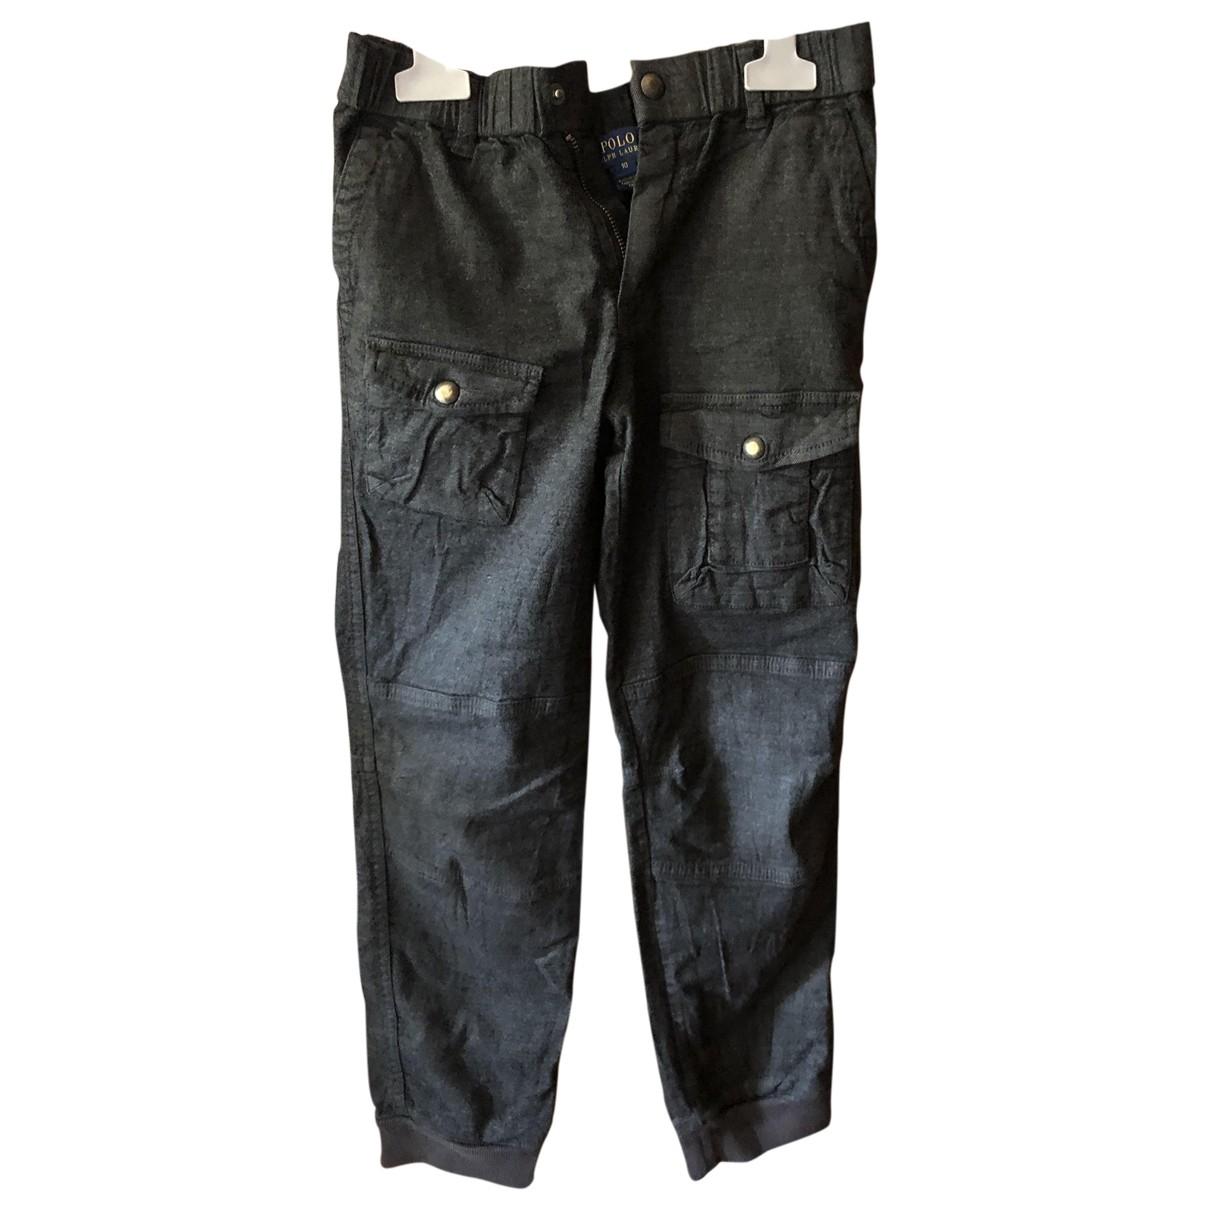 Pantalones en Algodon Gris Polo Ralph Lauren